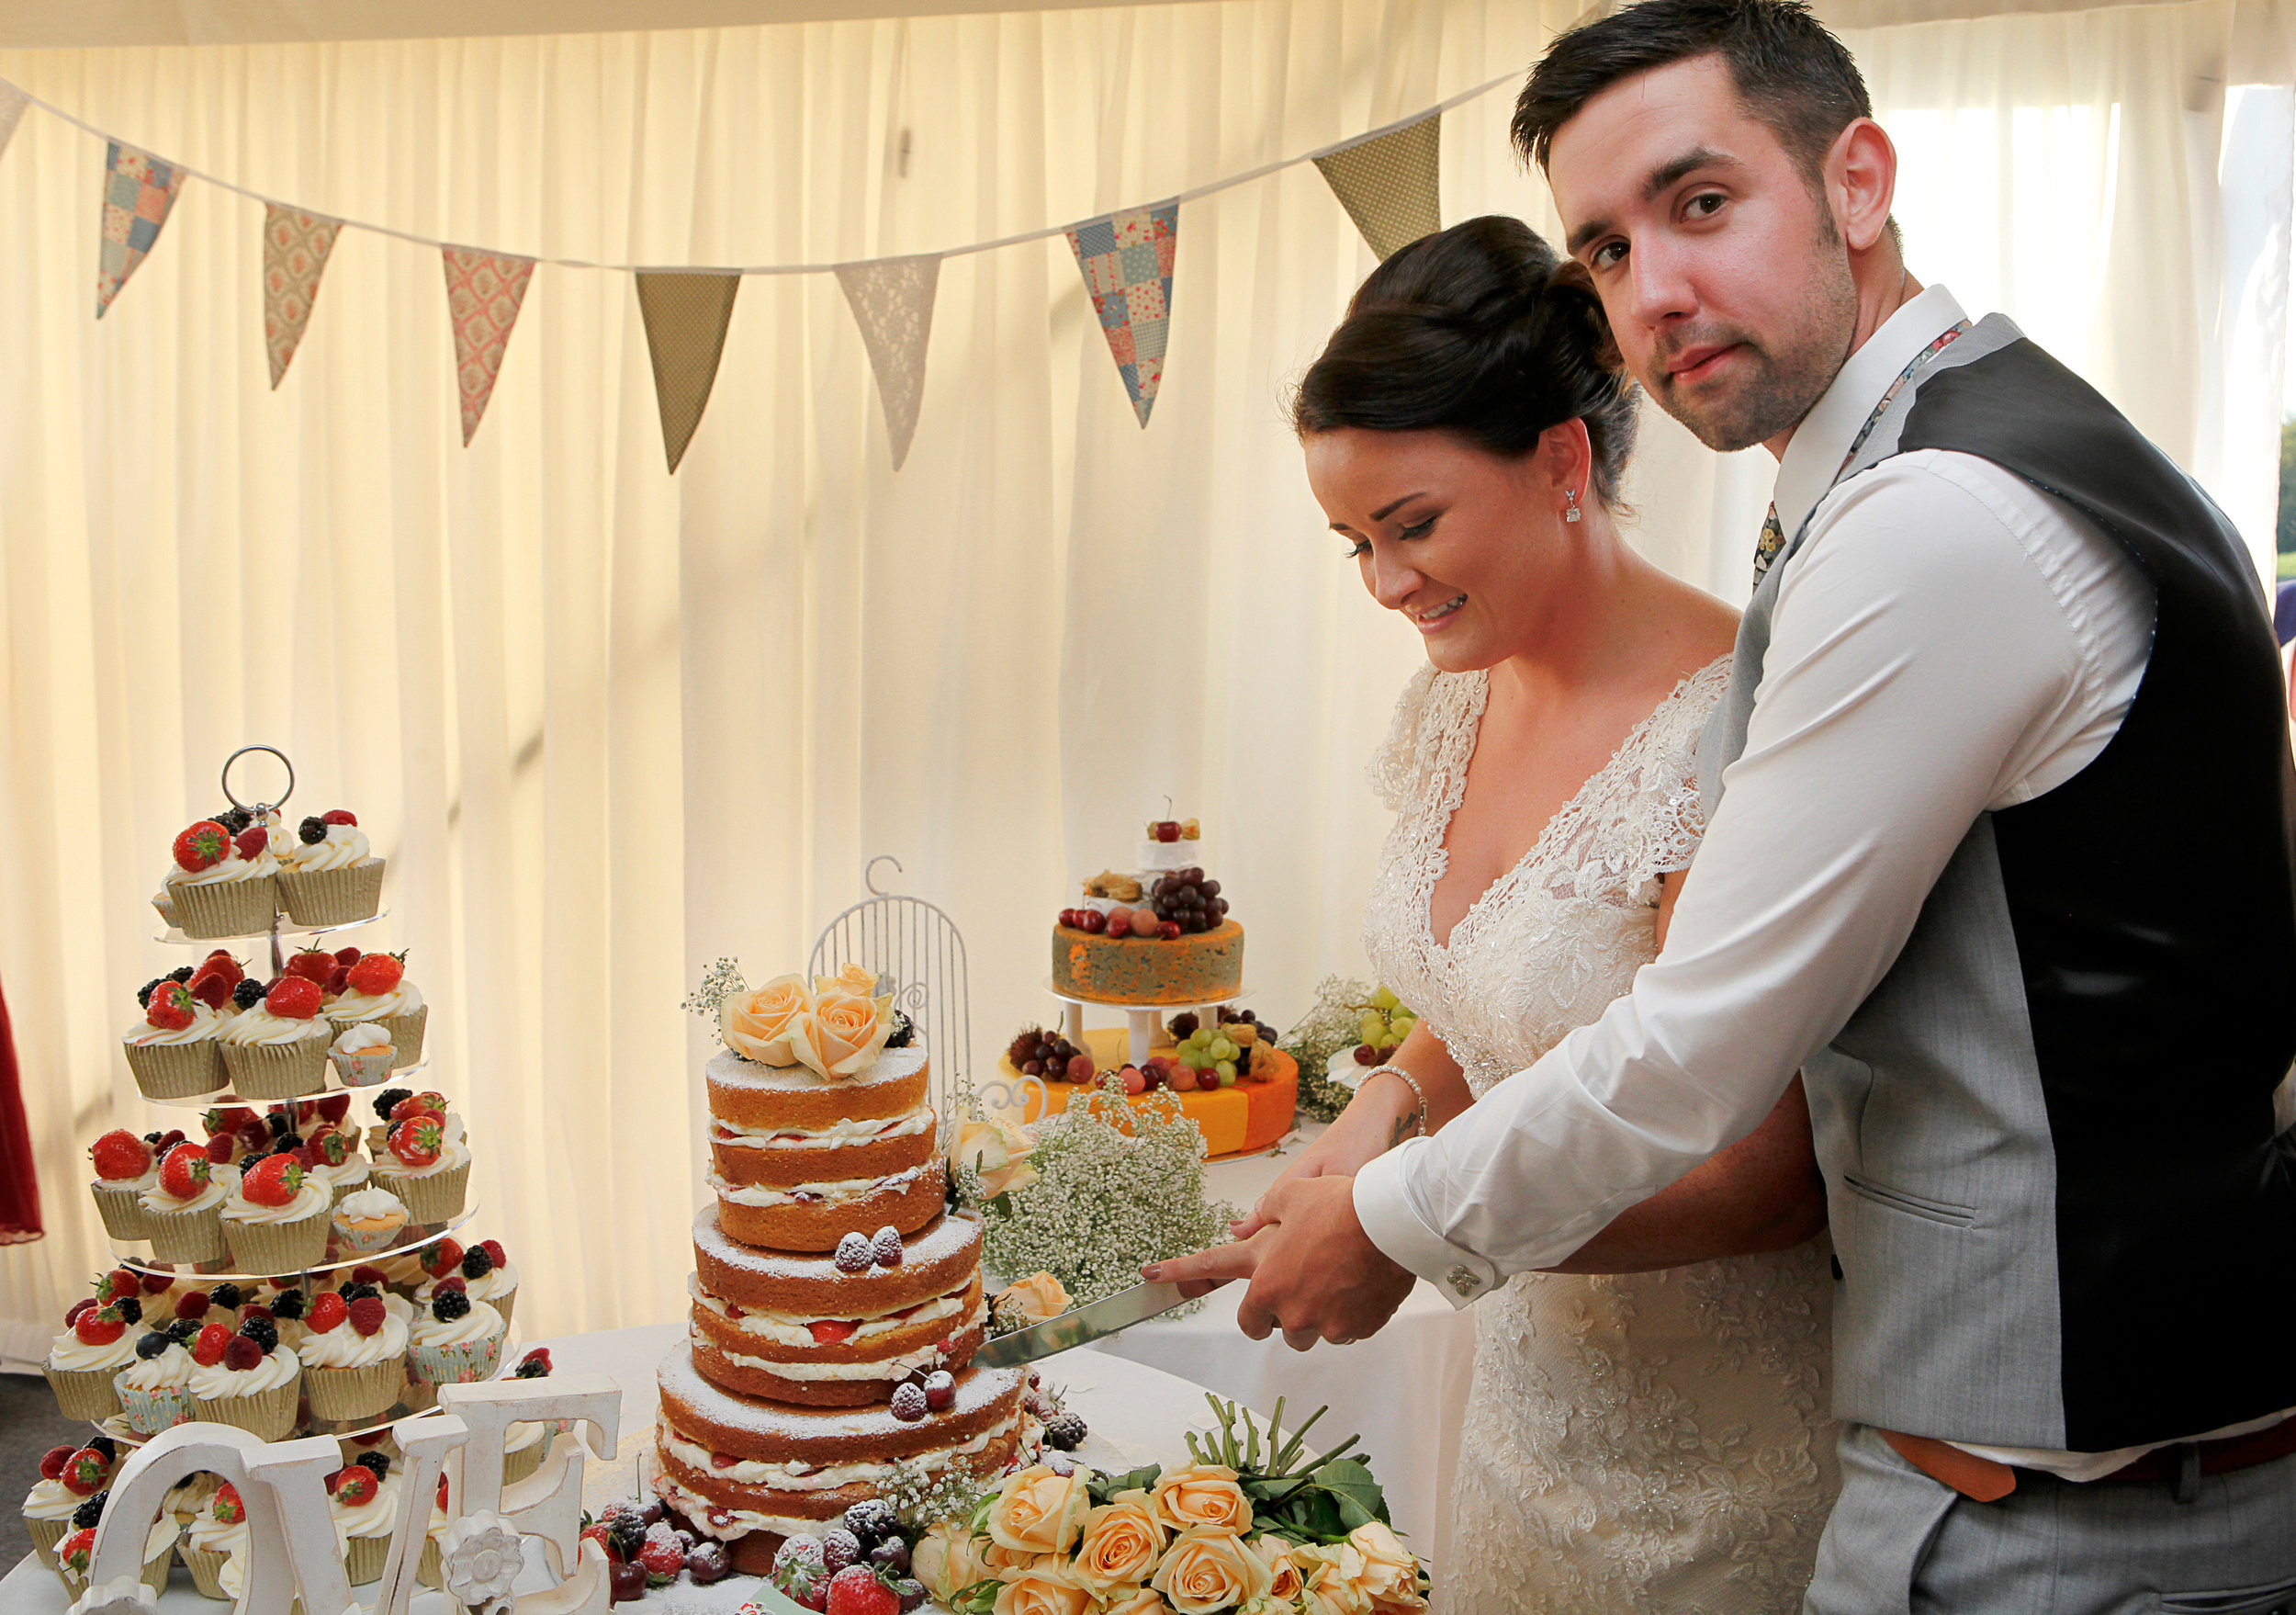 Shottle Hall Wedding AD642.jpg